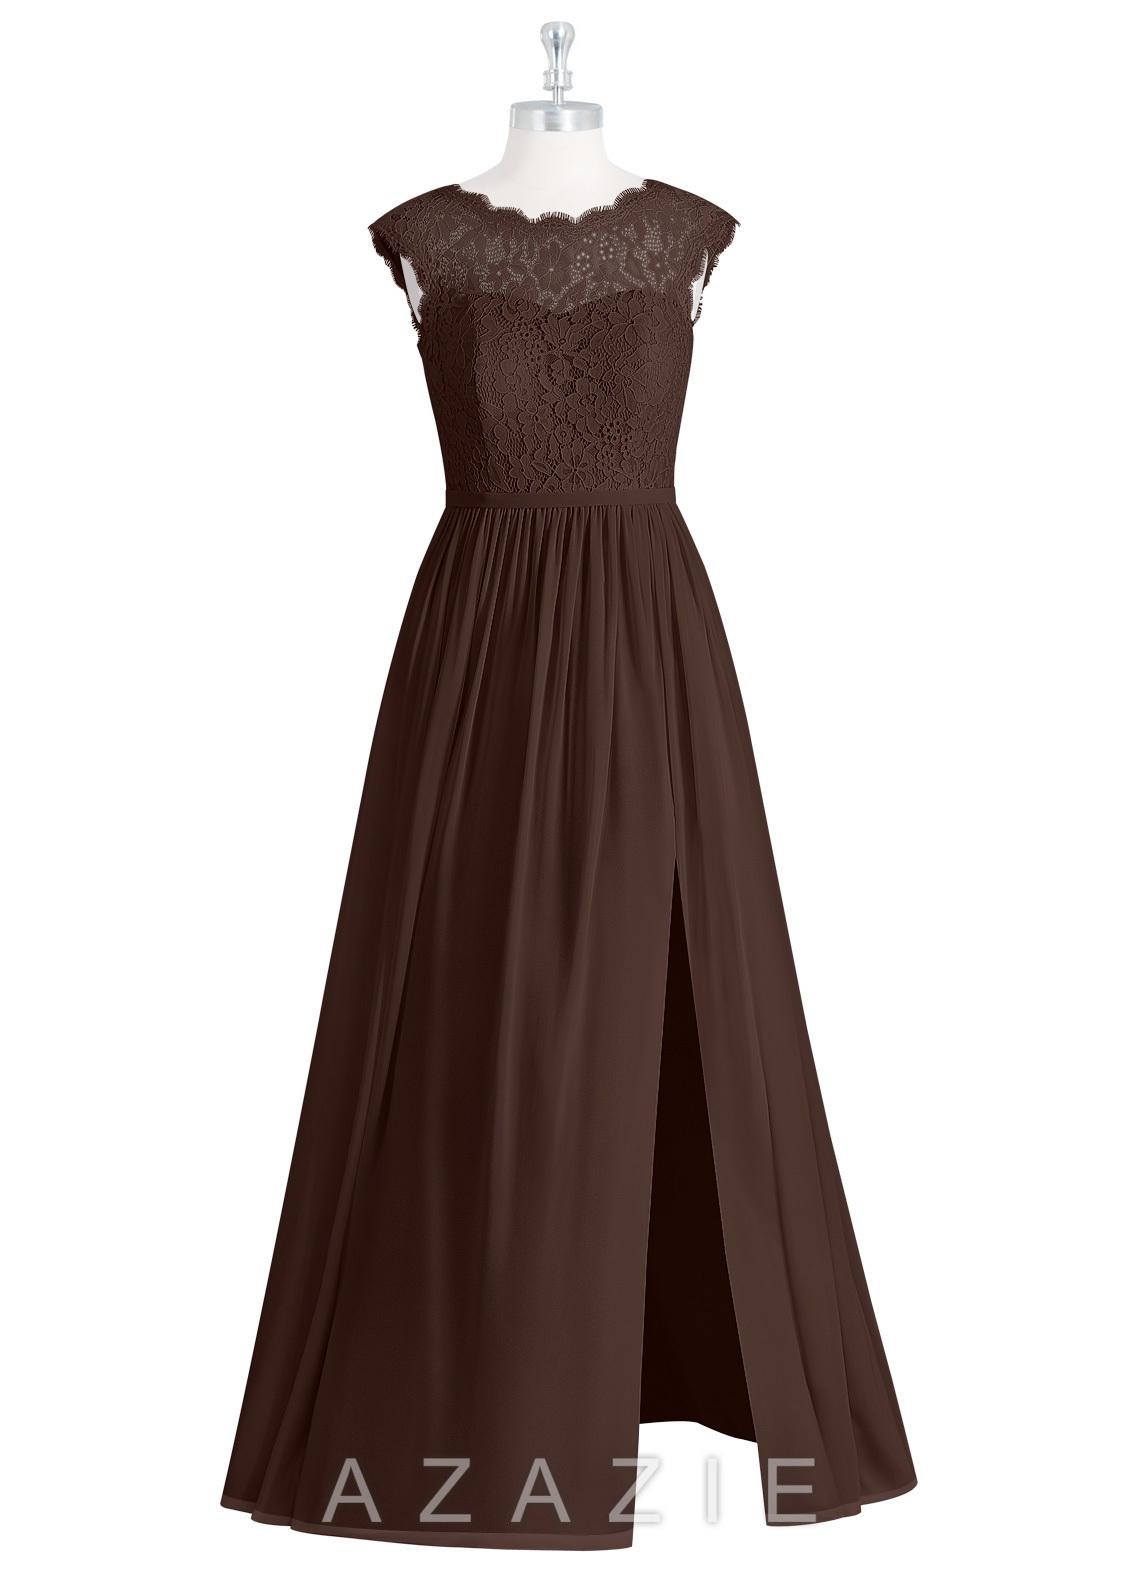 Azazie arden bridesmaid dress azazie color chocolate ombrellifo Choice Image